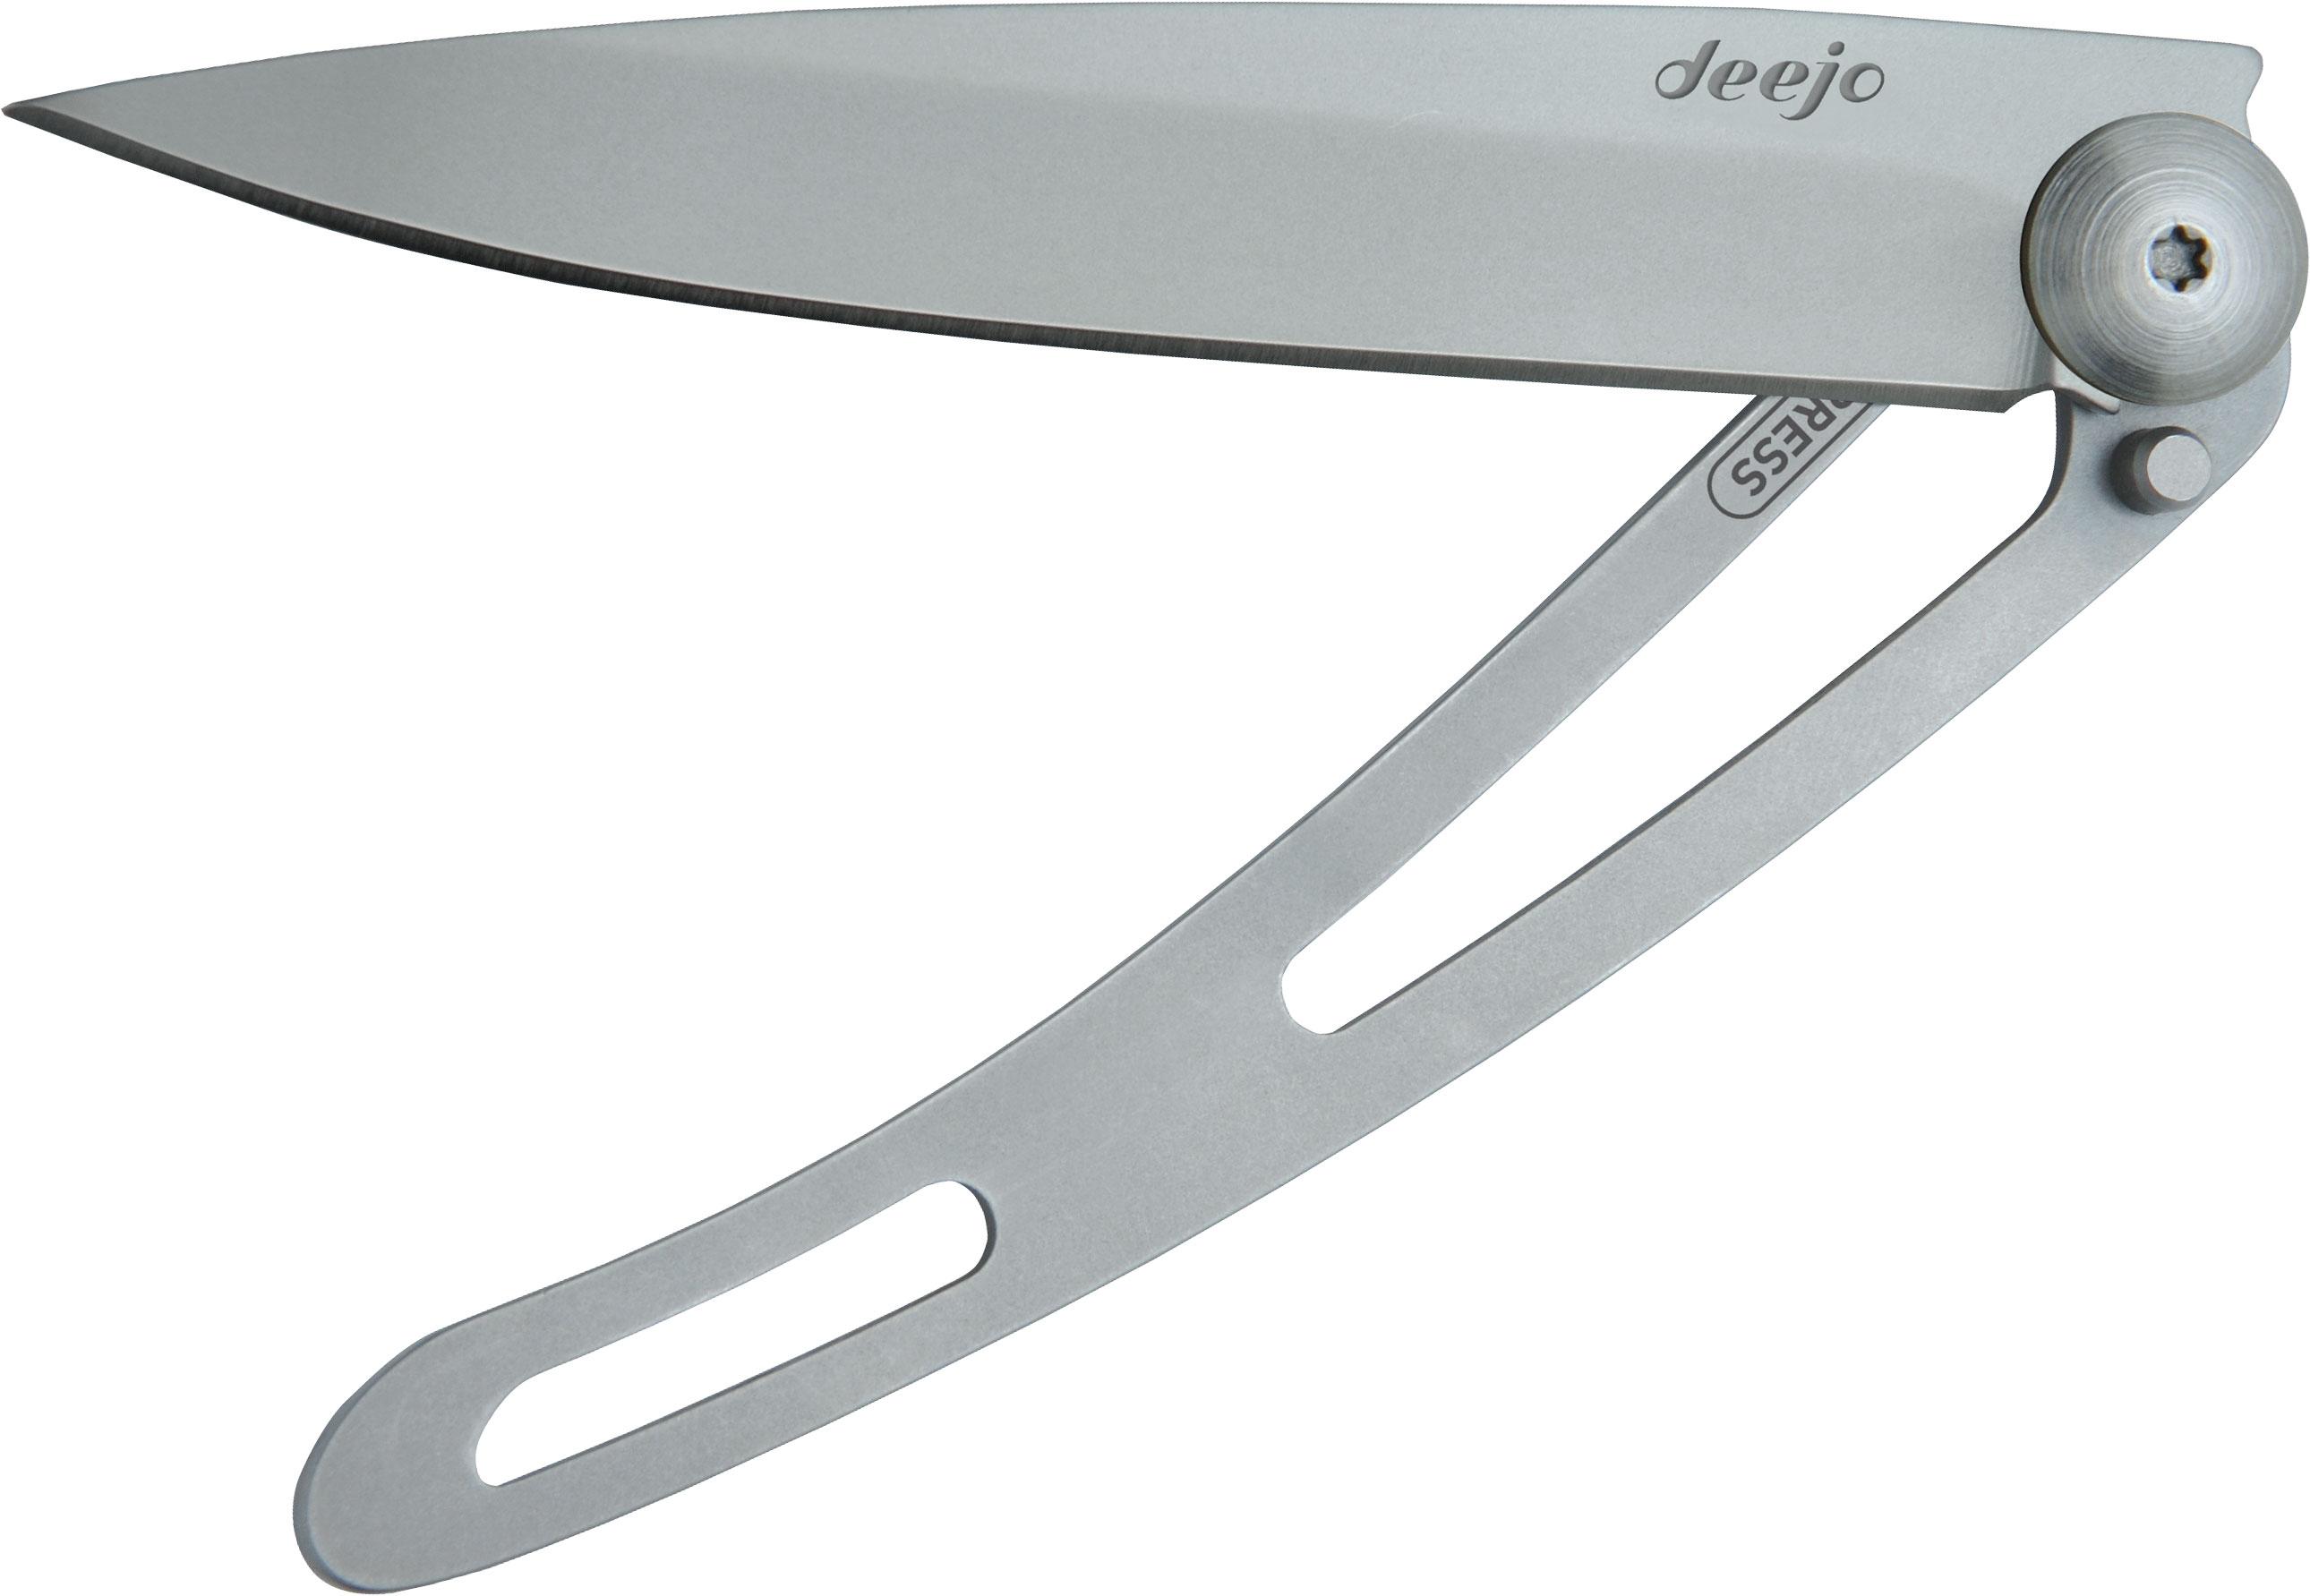 Deejo Knives Naked 37g Folding Knife 3.75 Satin Plain